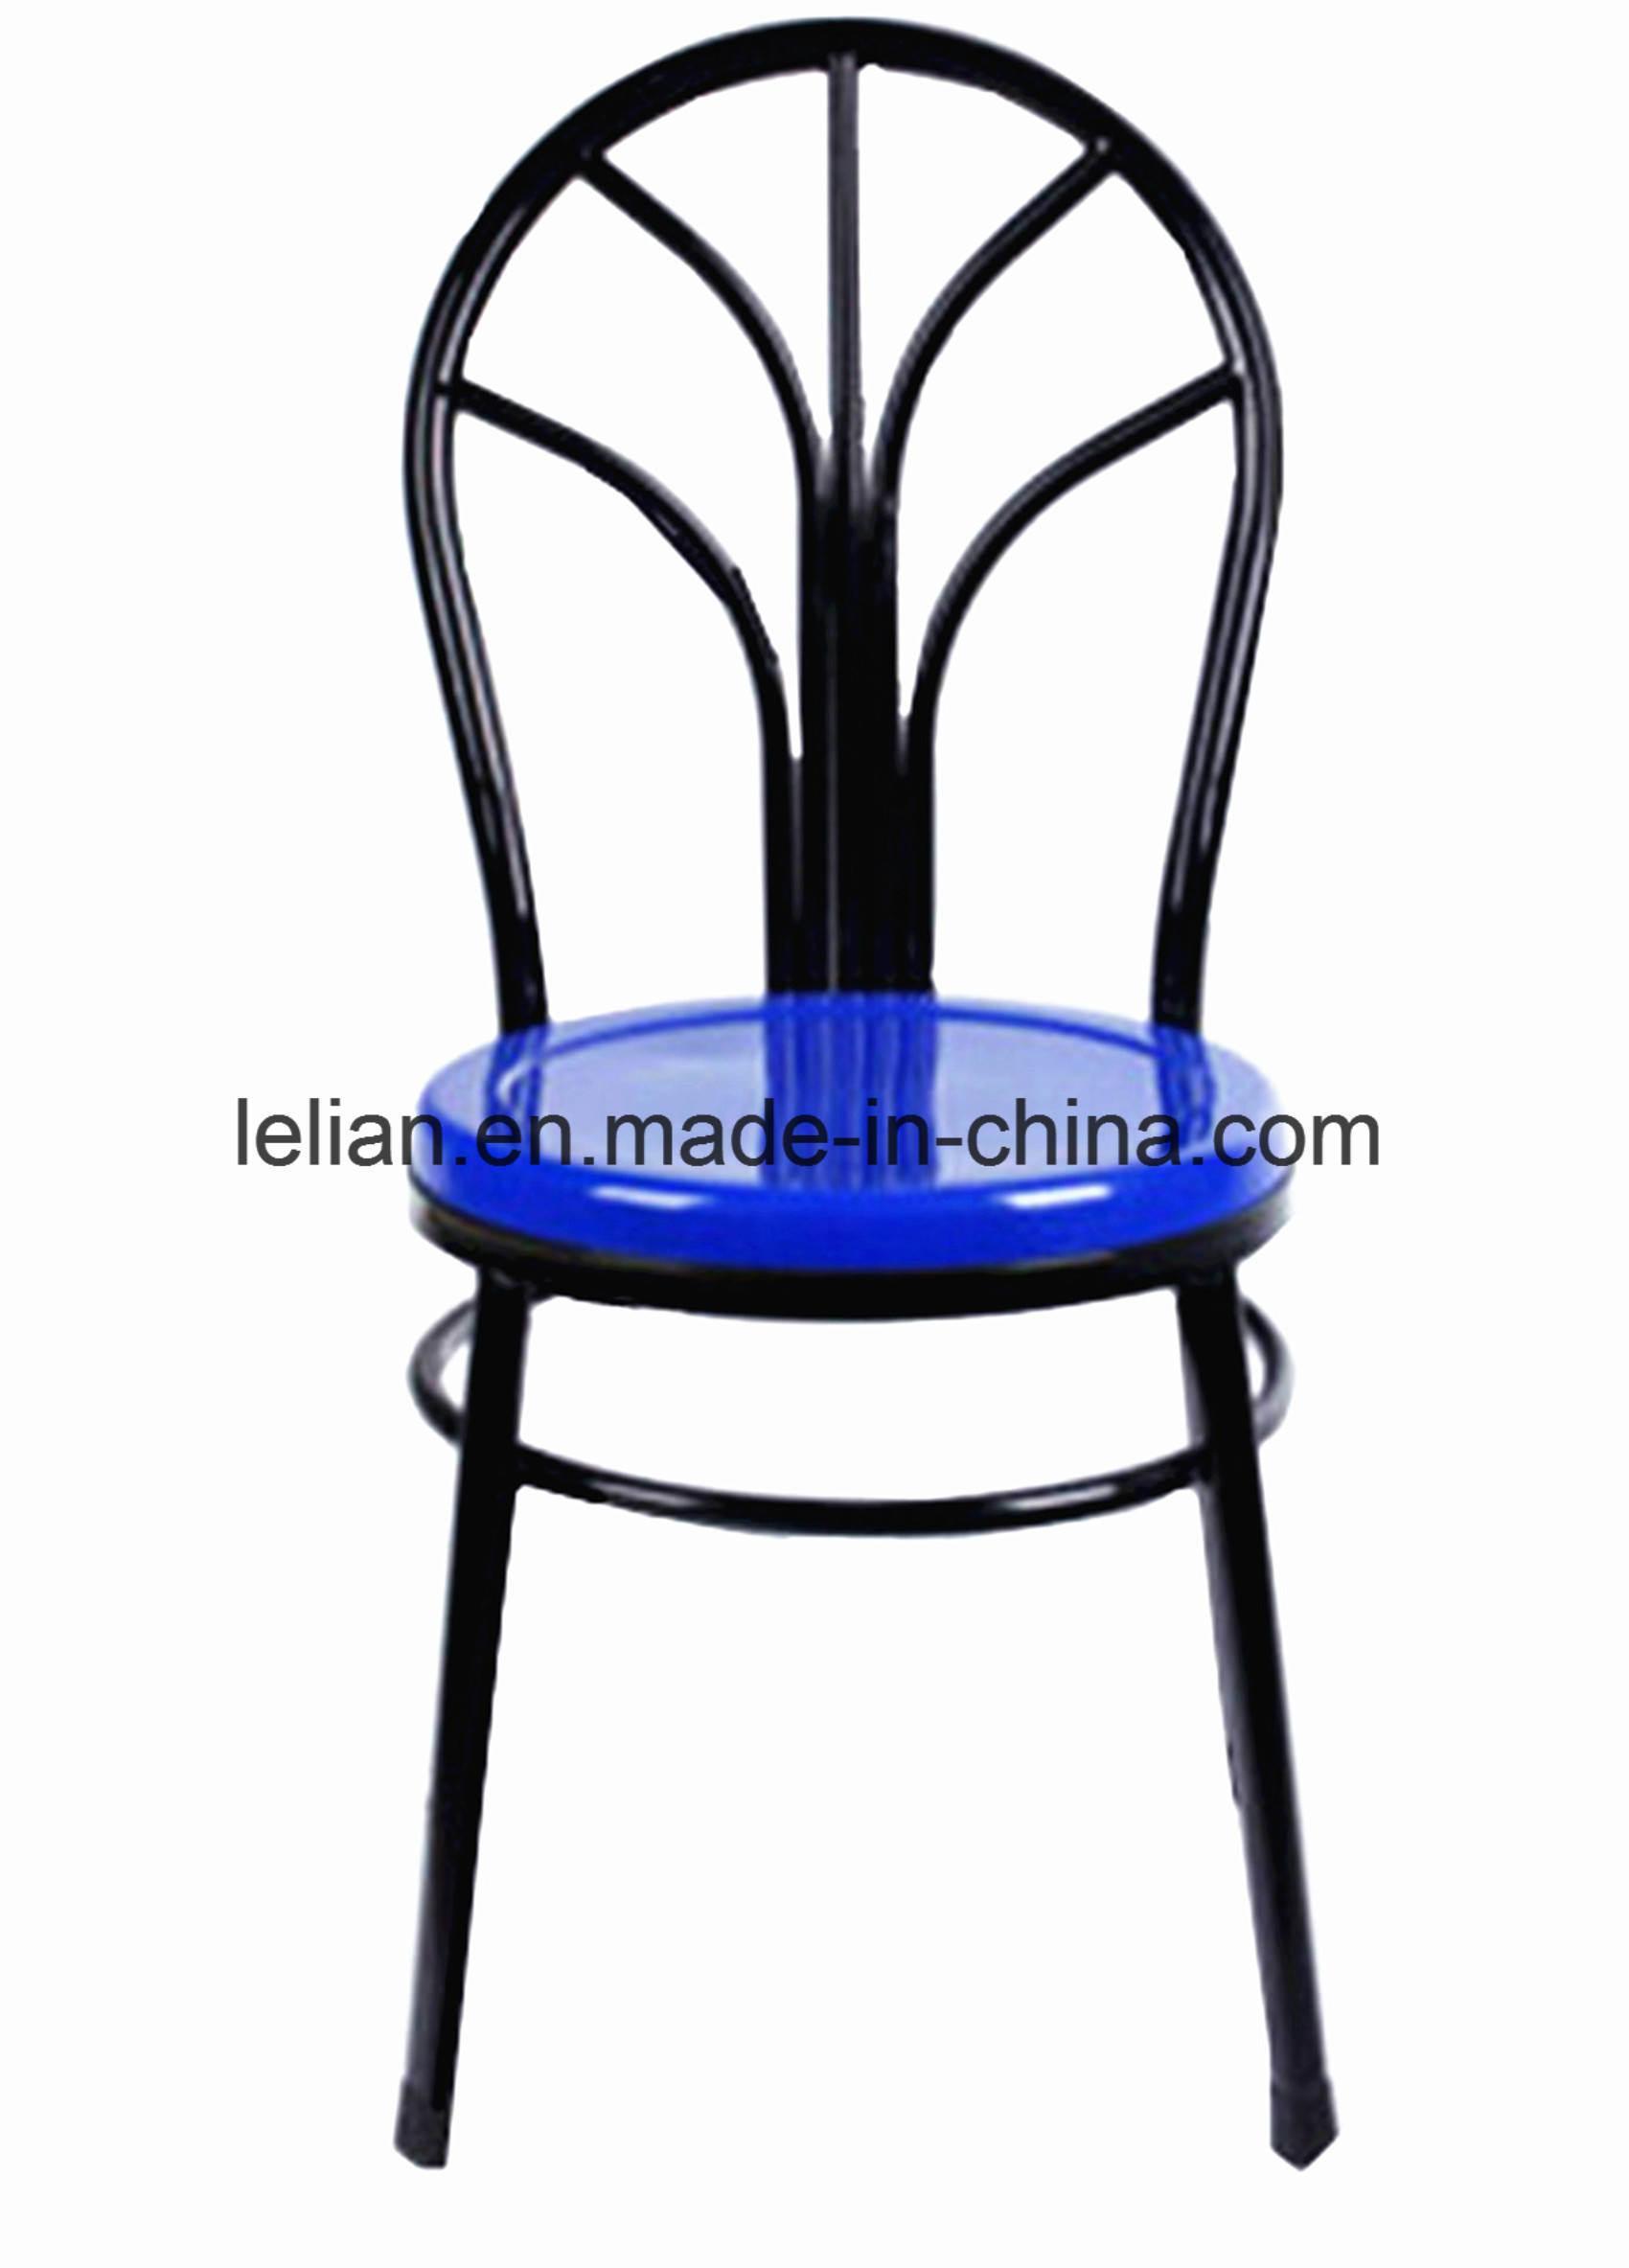 Heavy Duty Restaurant Fiber Glass Dining Chair, Dining Stool (LL-0025)